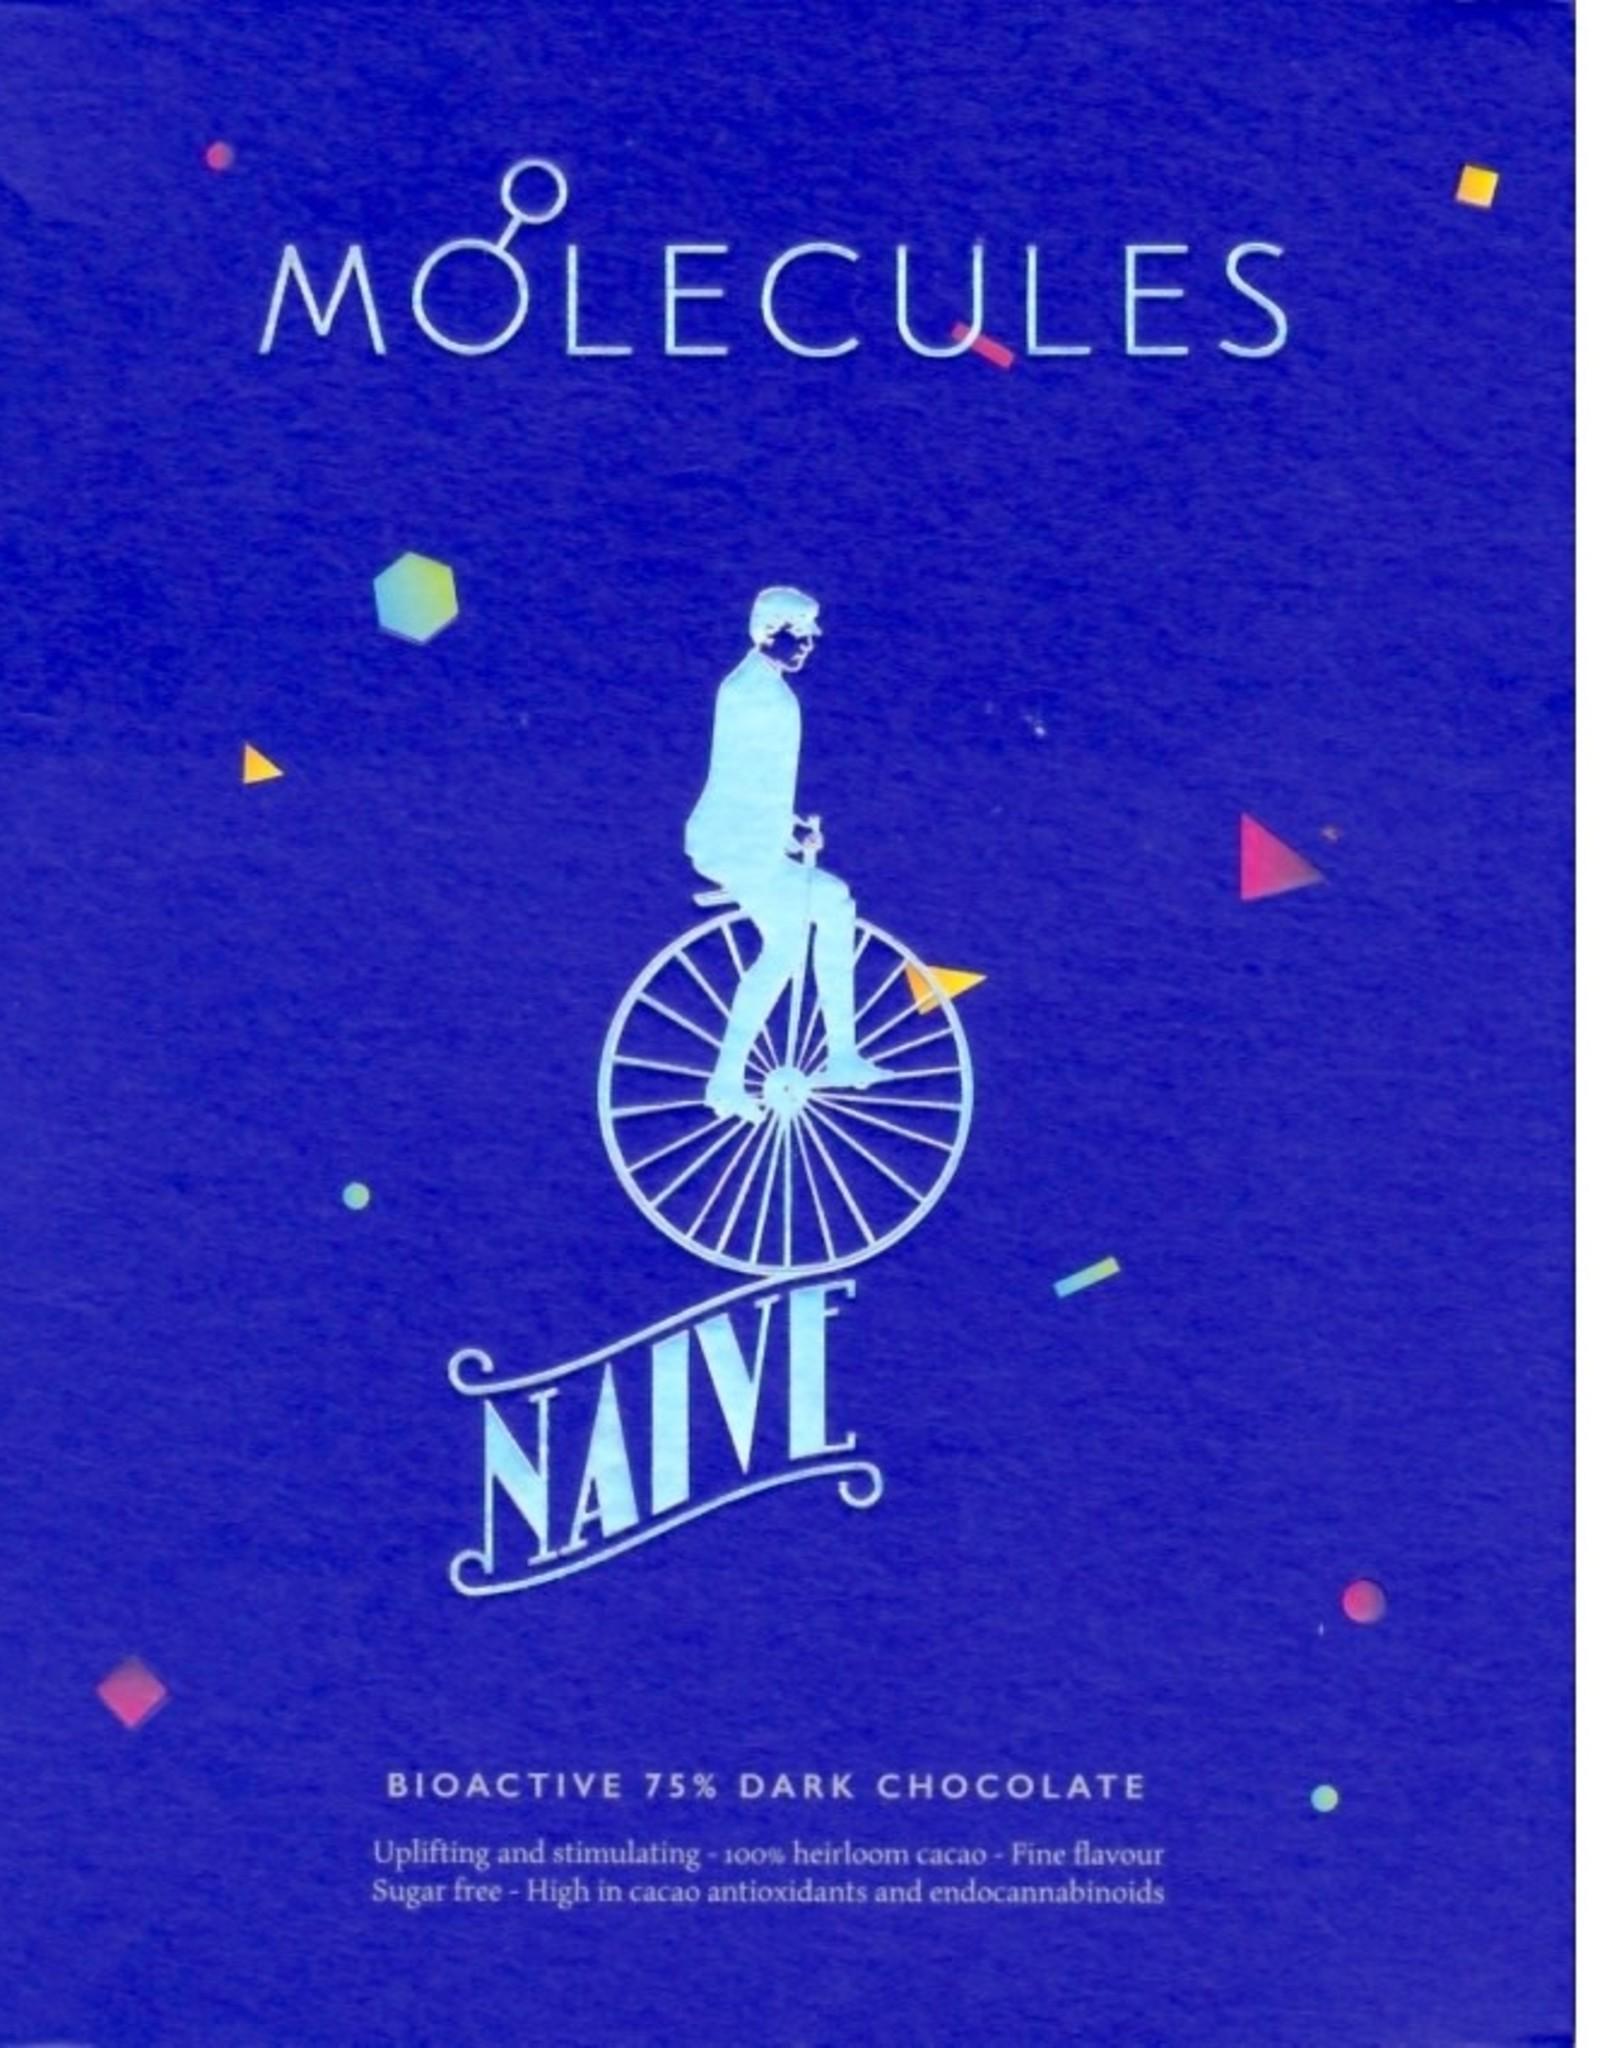 NAÏVE, Lithuania Naive Molecules, Bioactive, 75%